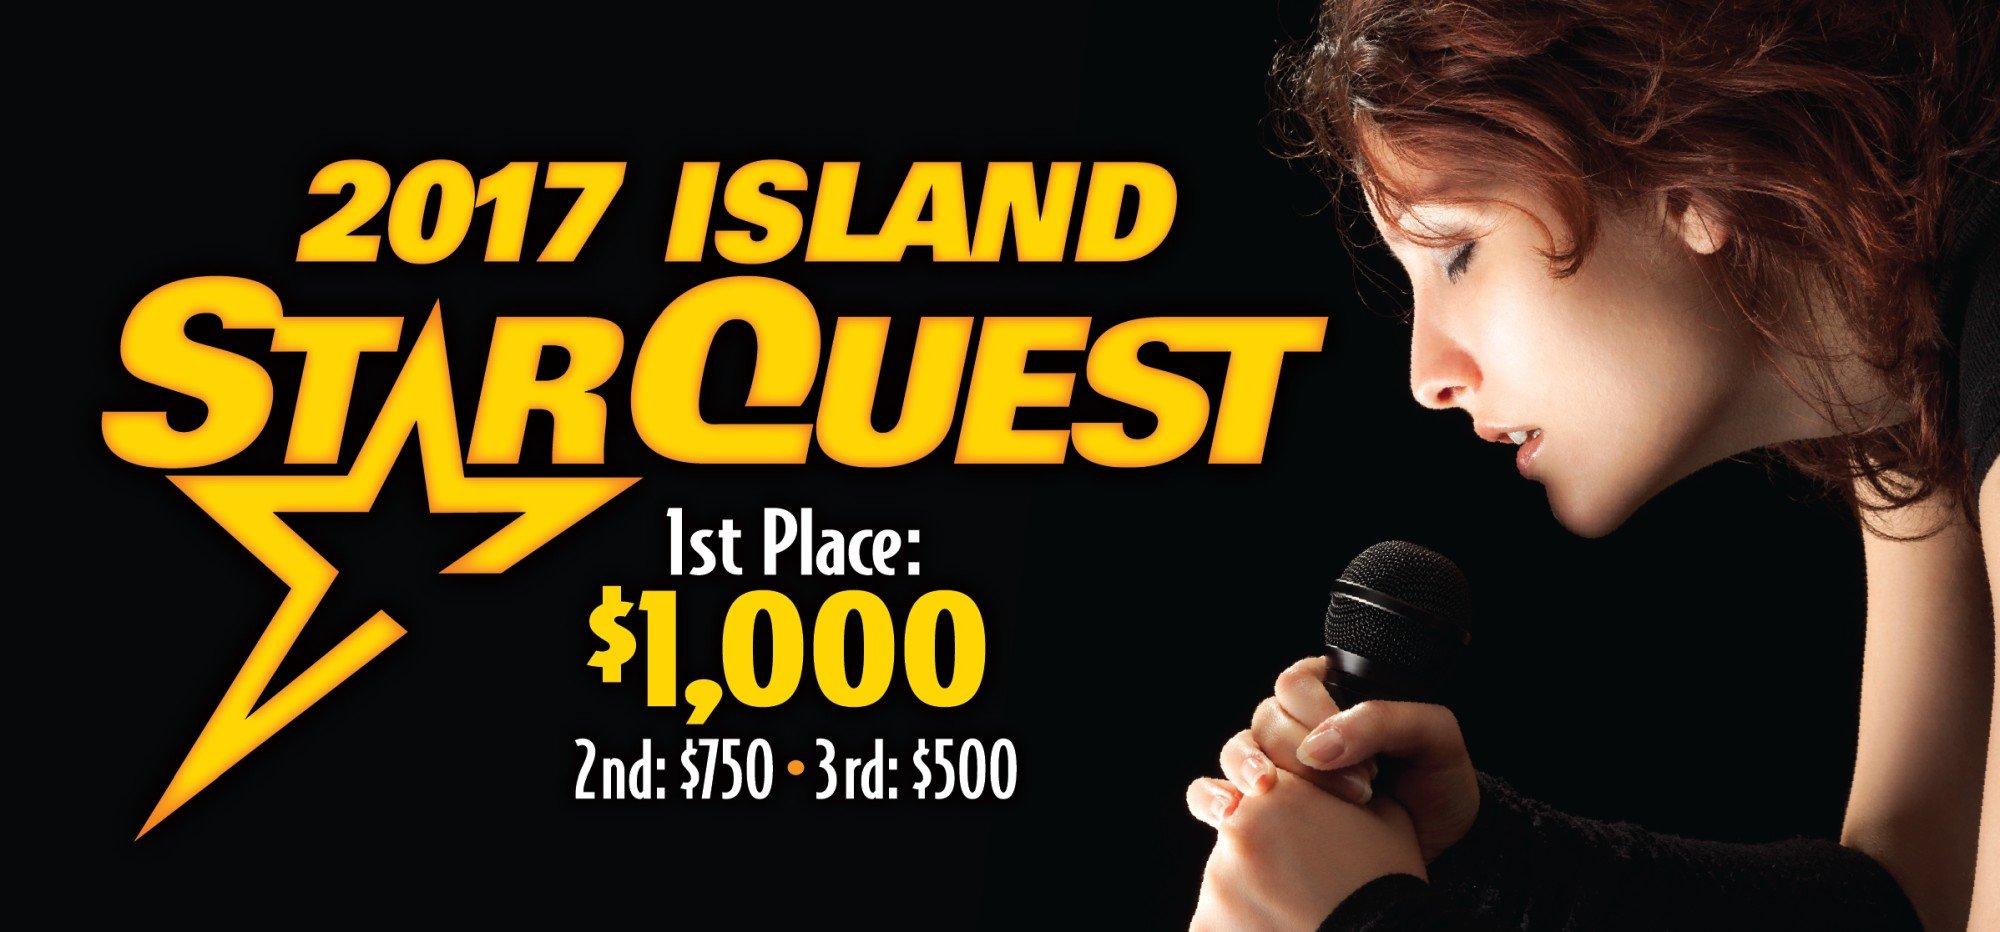 Island StarQuest '17